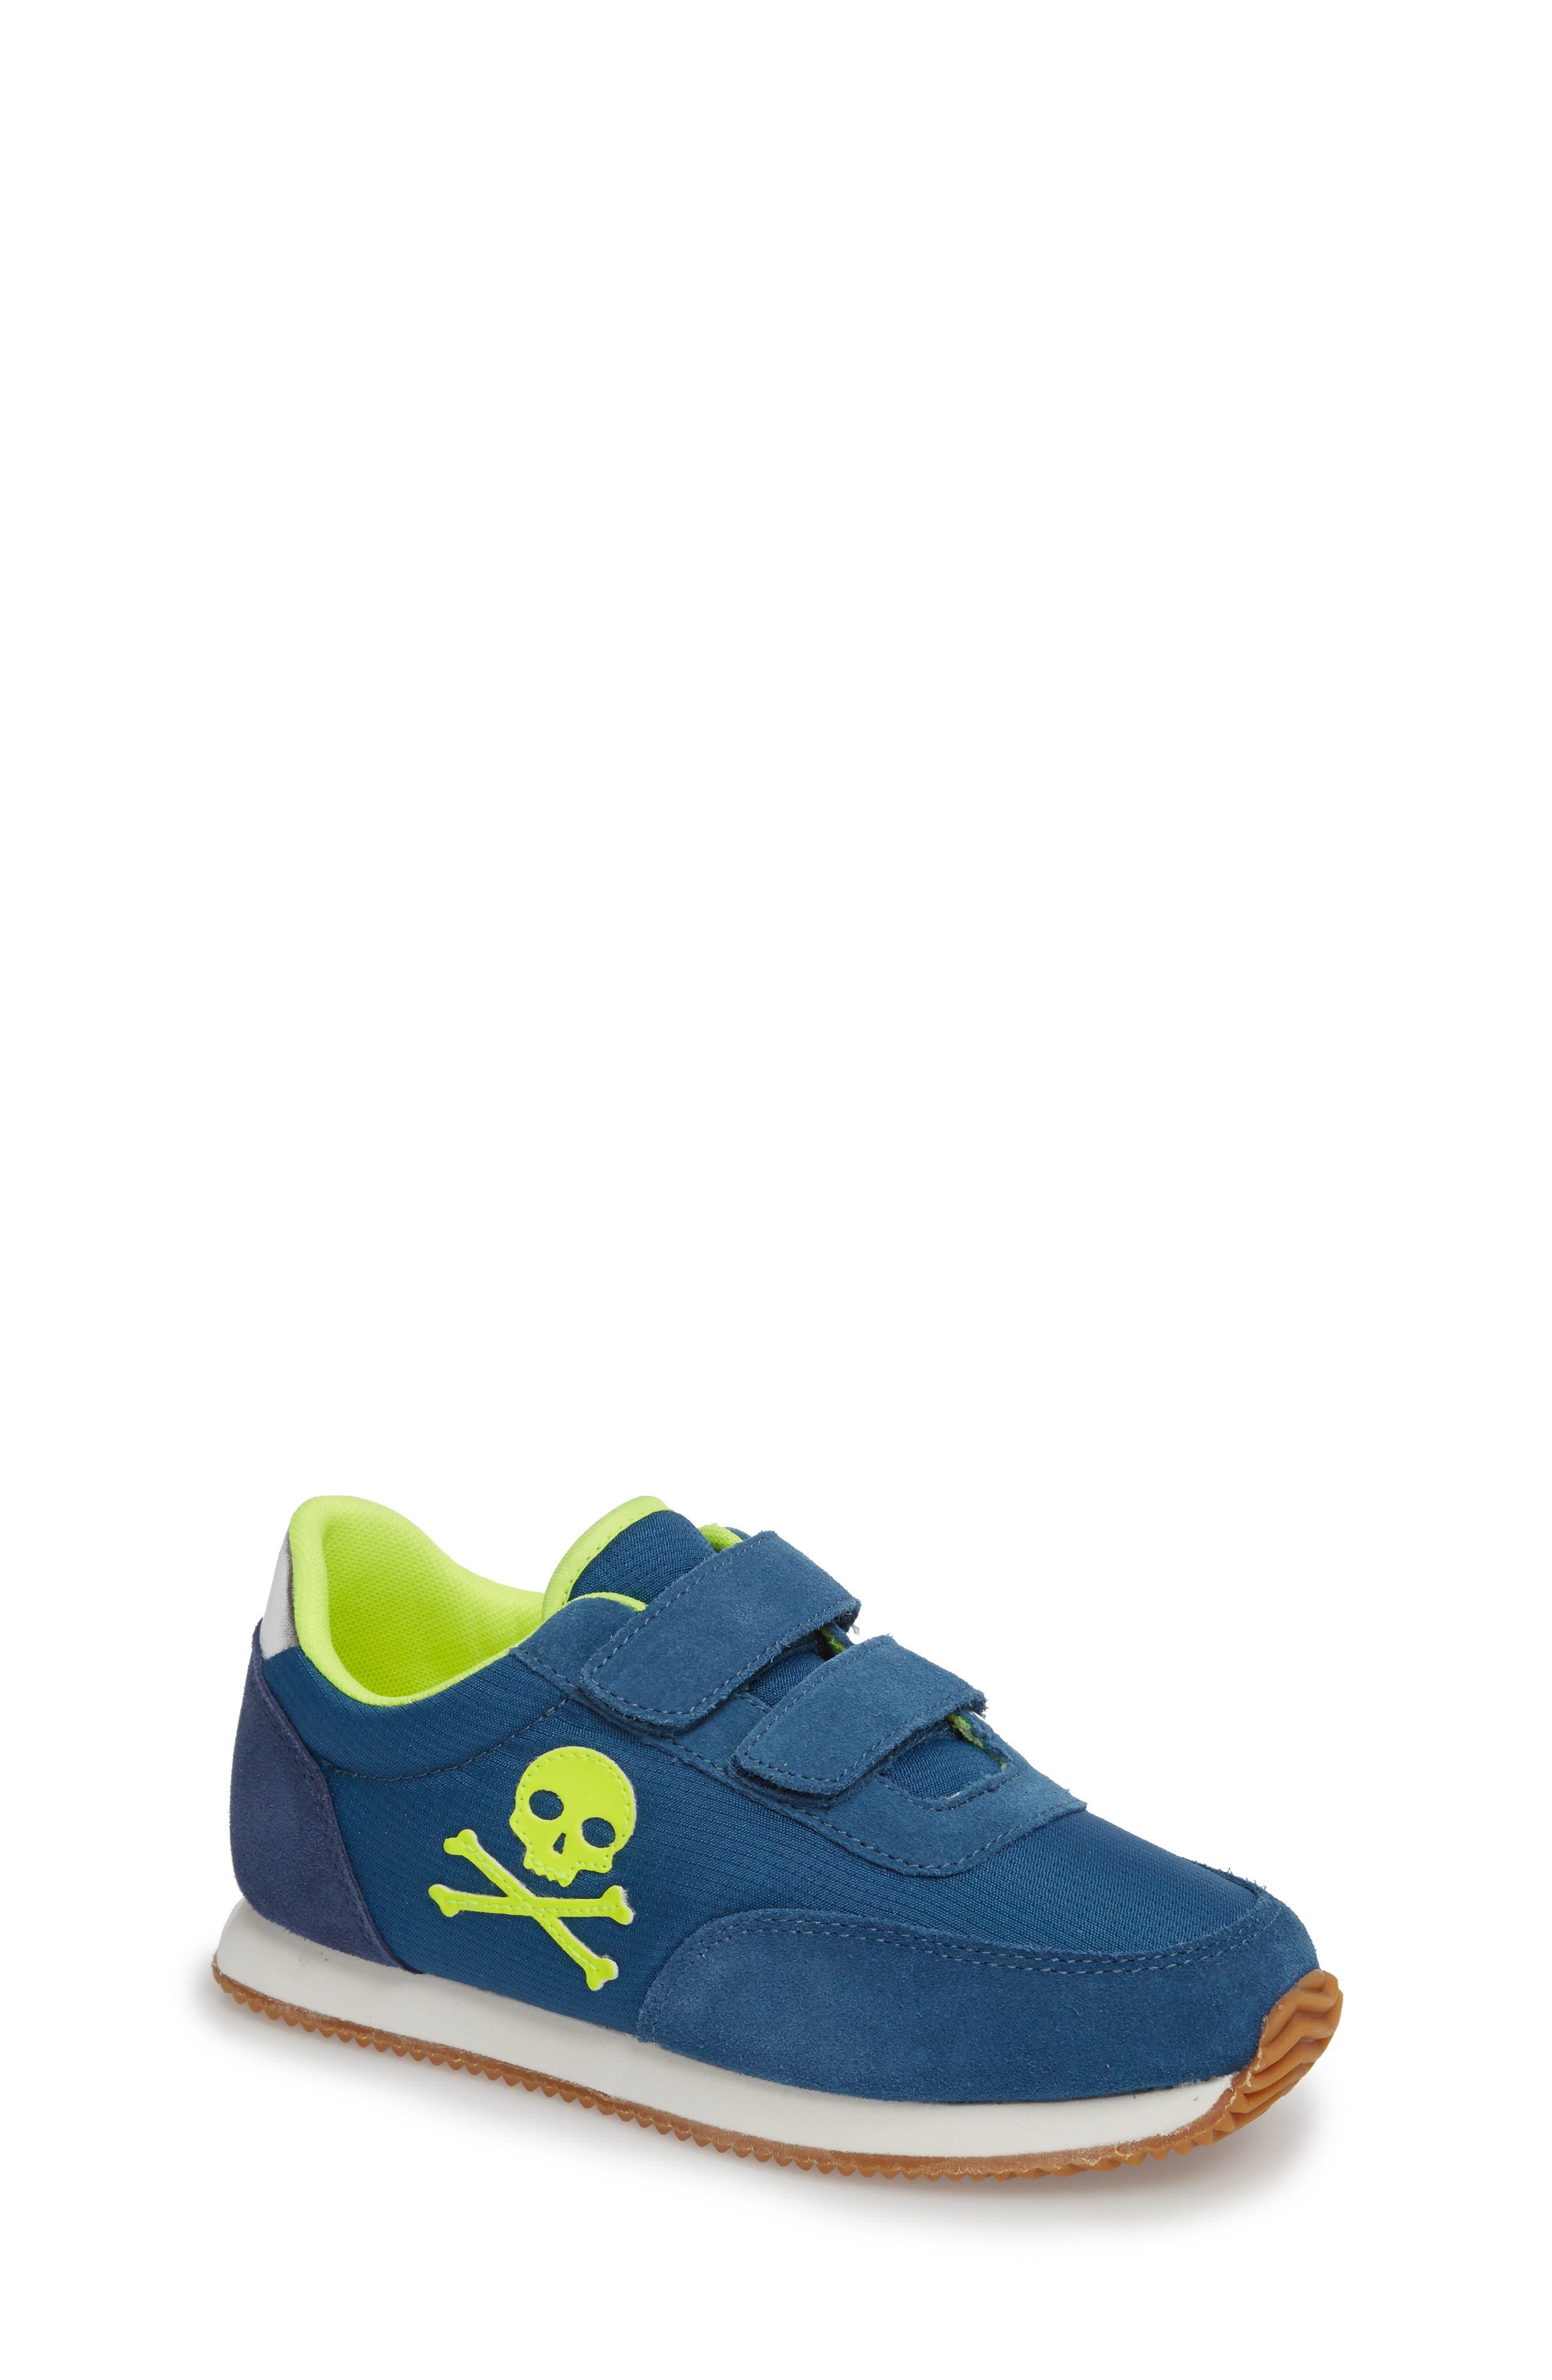 Alternate Image 1 Selected - Mini Boden Print Sneakers (Toddler, Little Kid & Big Kid)